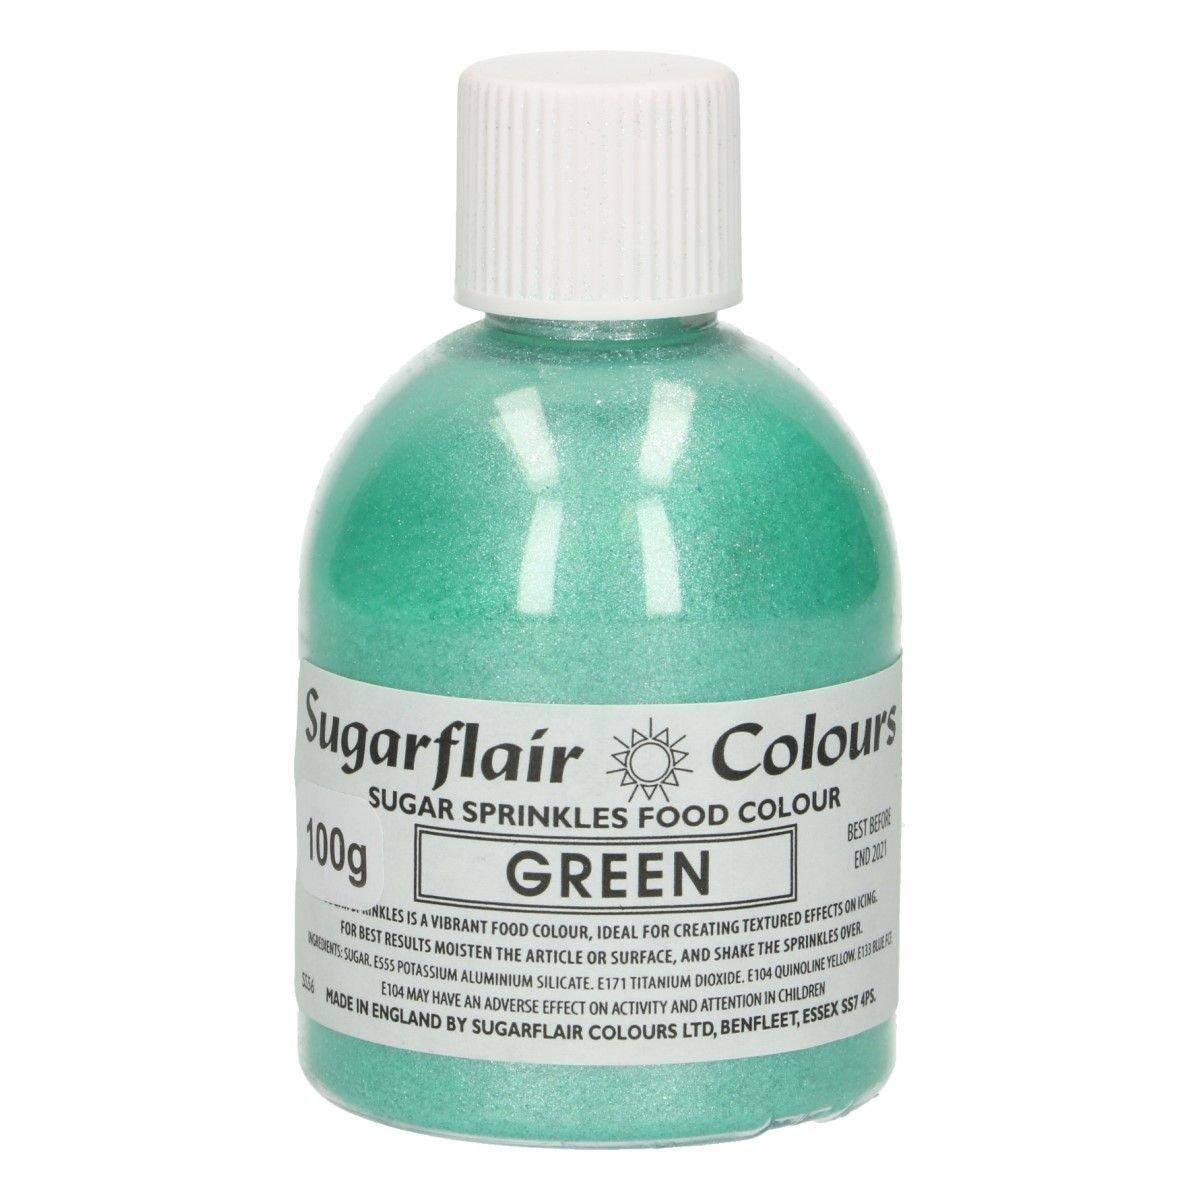 Sugarflair -Sparkling Sugar Sprinkles -GREEN 100g - Χρωματιστή Ζάχαρη - Πράσινη